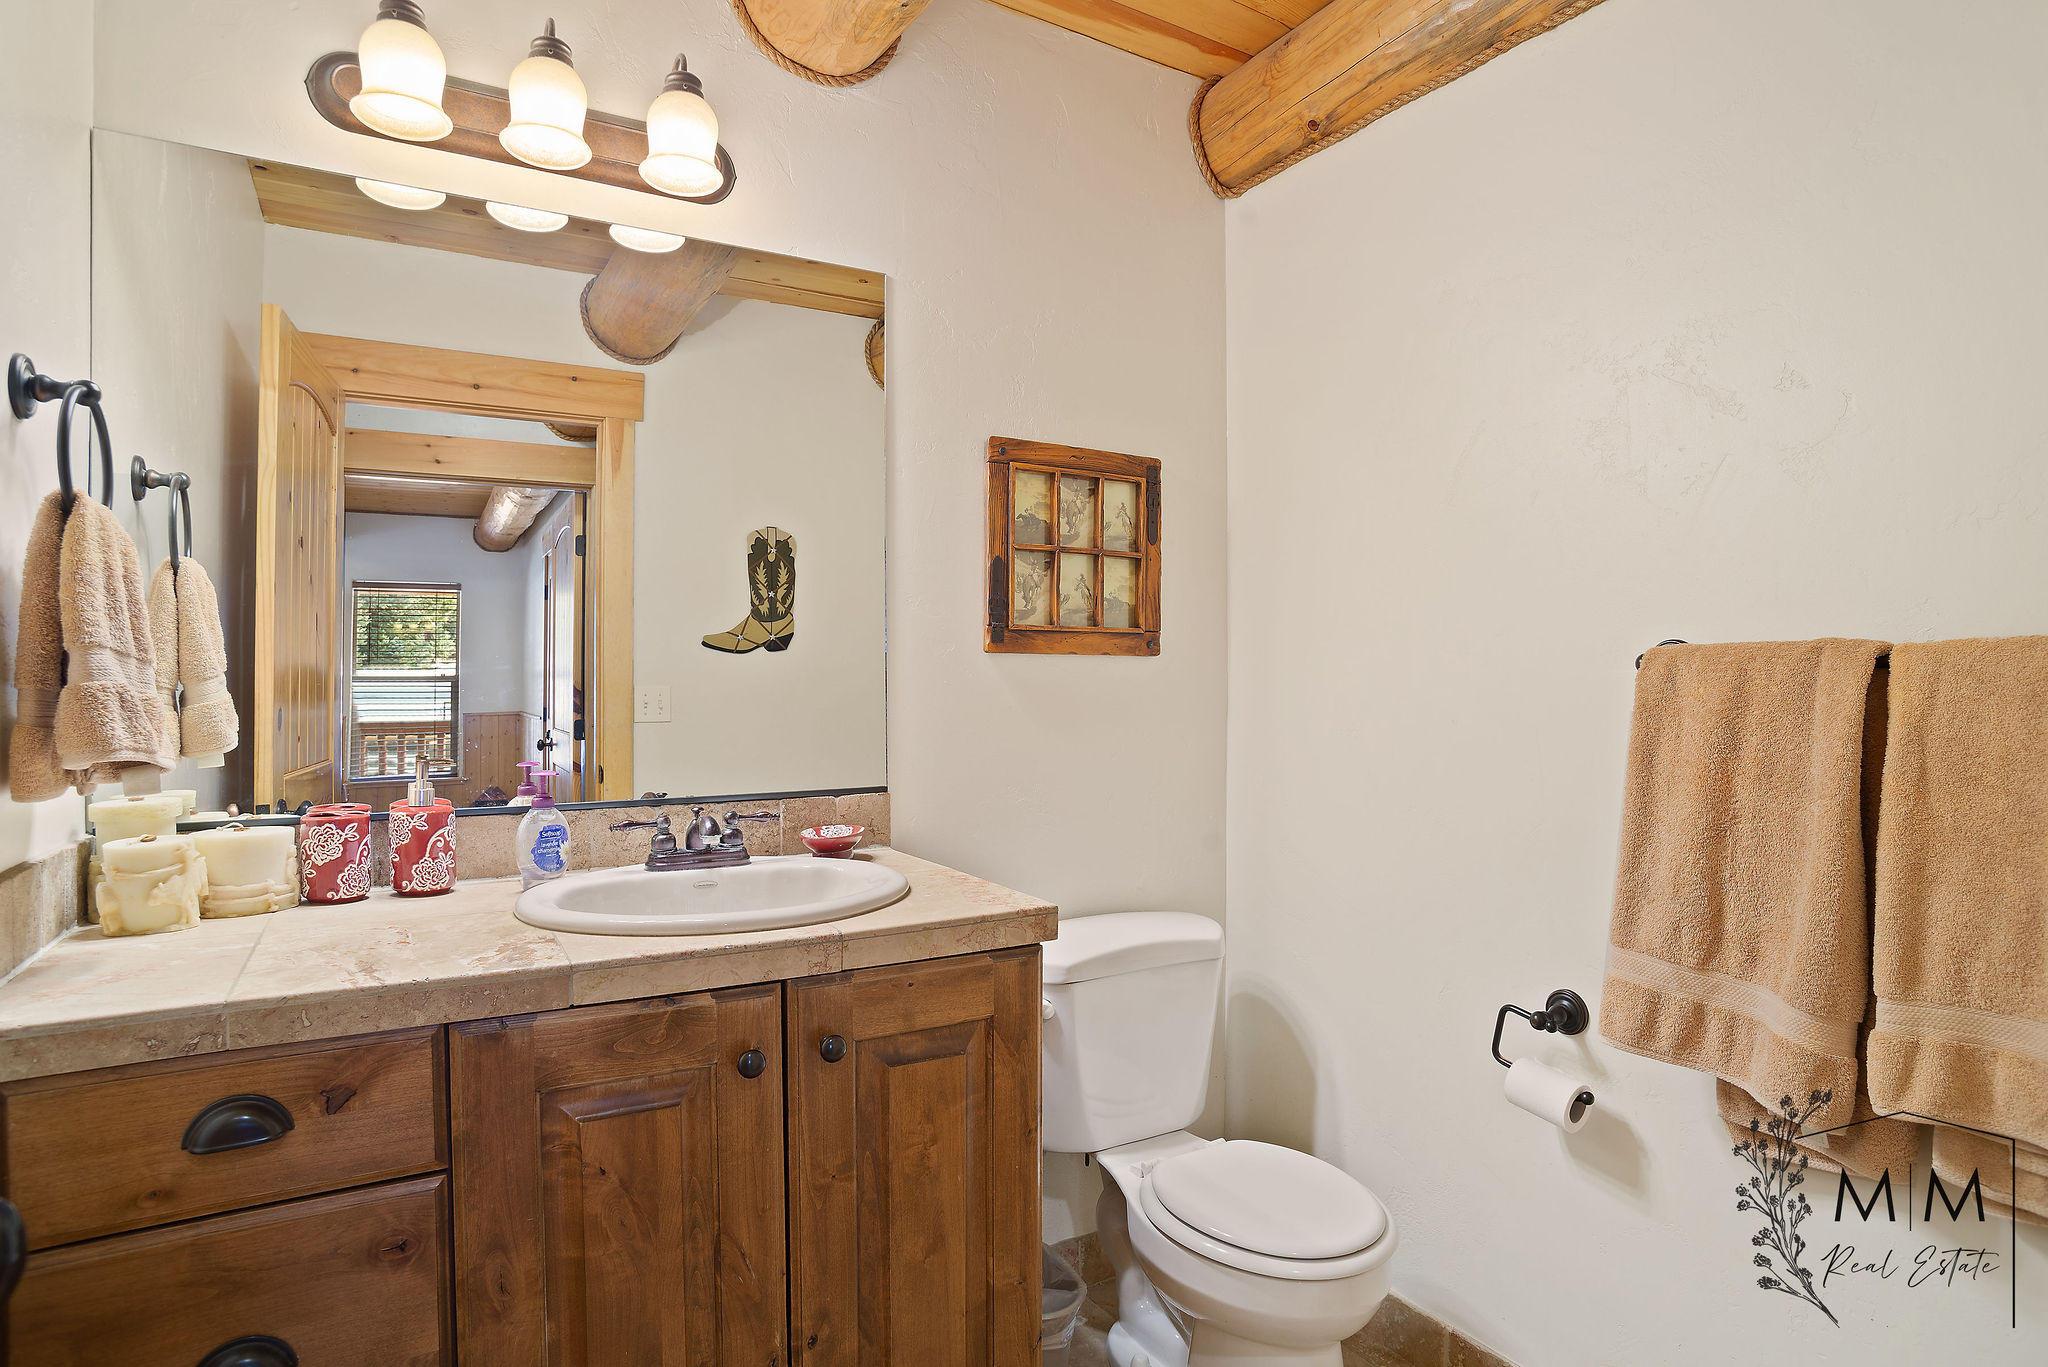 92250 1260 Henry RD Duck Creek Village UT